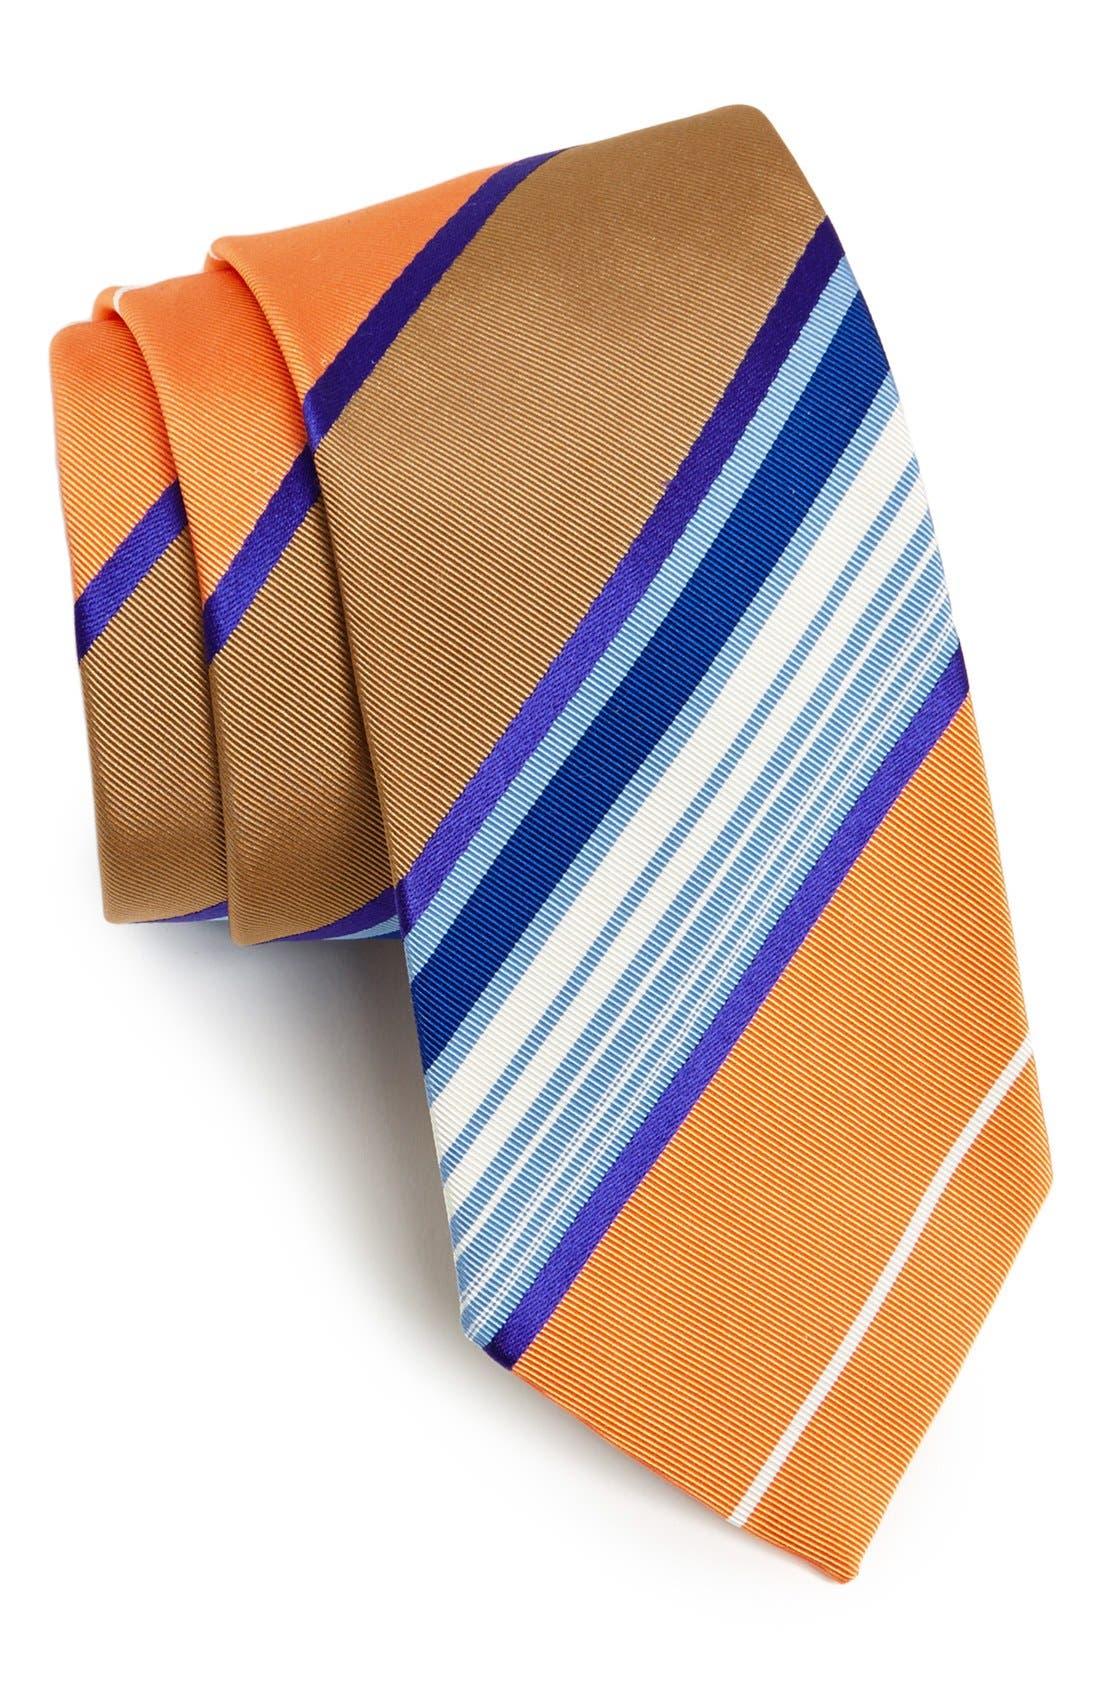 Alternate Image 1 Selected - Etro Woven Silk & Cotton Tie